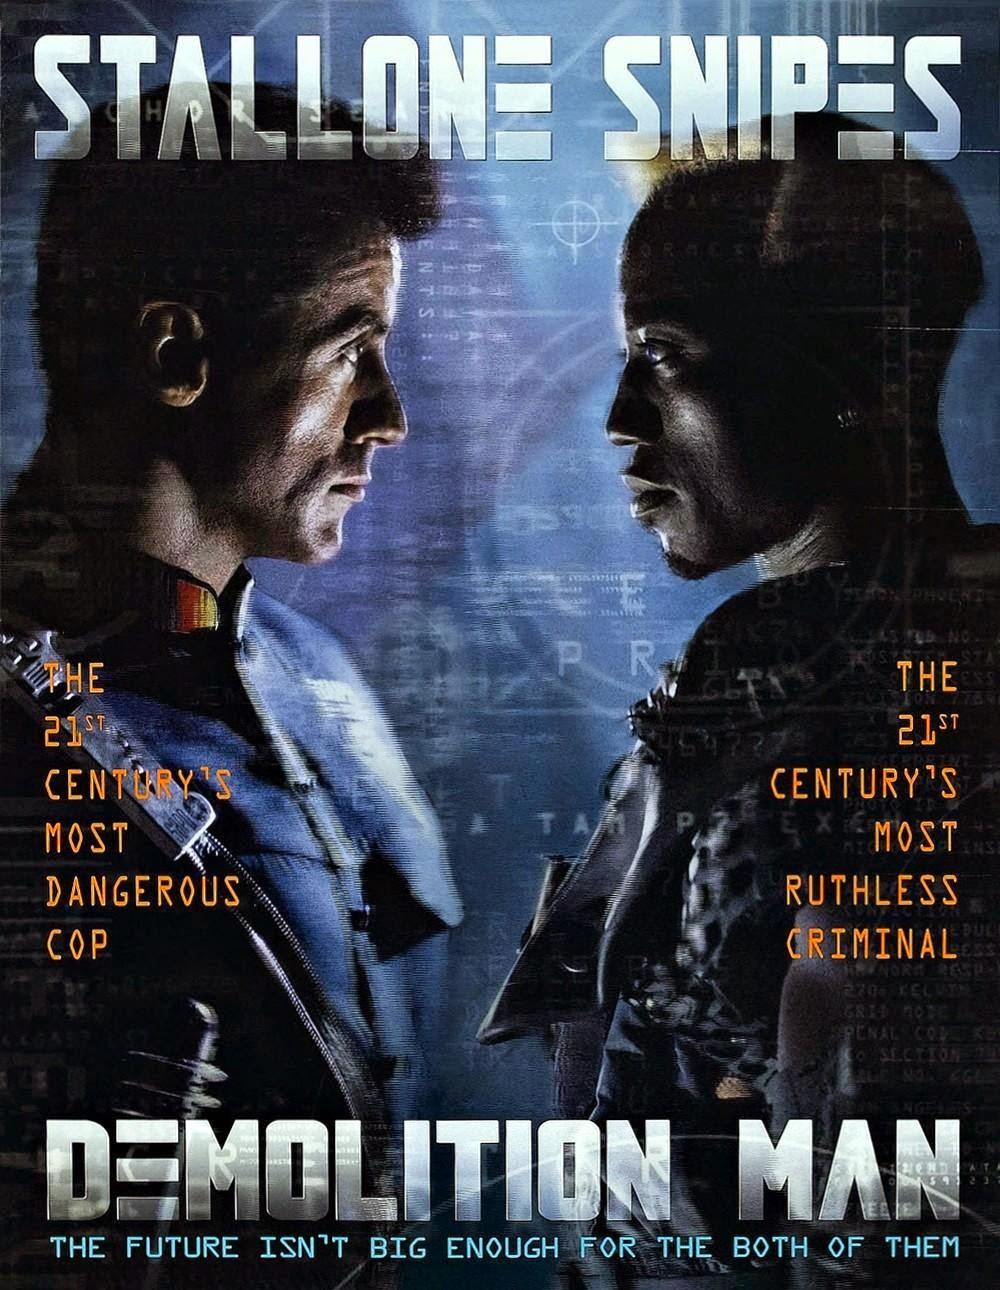 Demolition Man (Released in 1993) - A corny futuristic movie starring Sylvester Stallone, Wesley Snipes, Sandra Bullock, Nigel Hawthorne